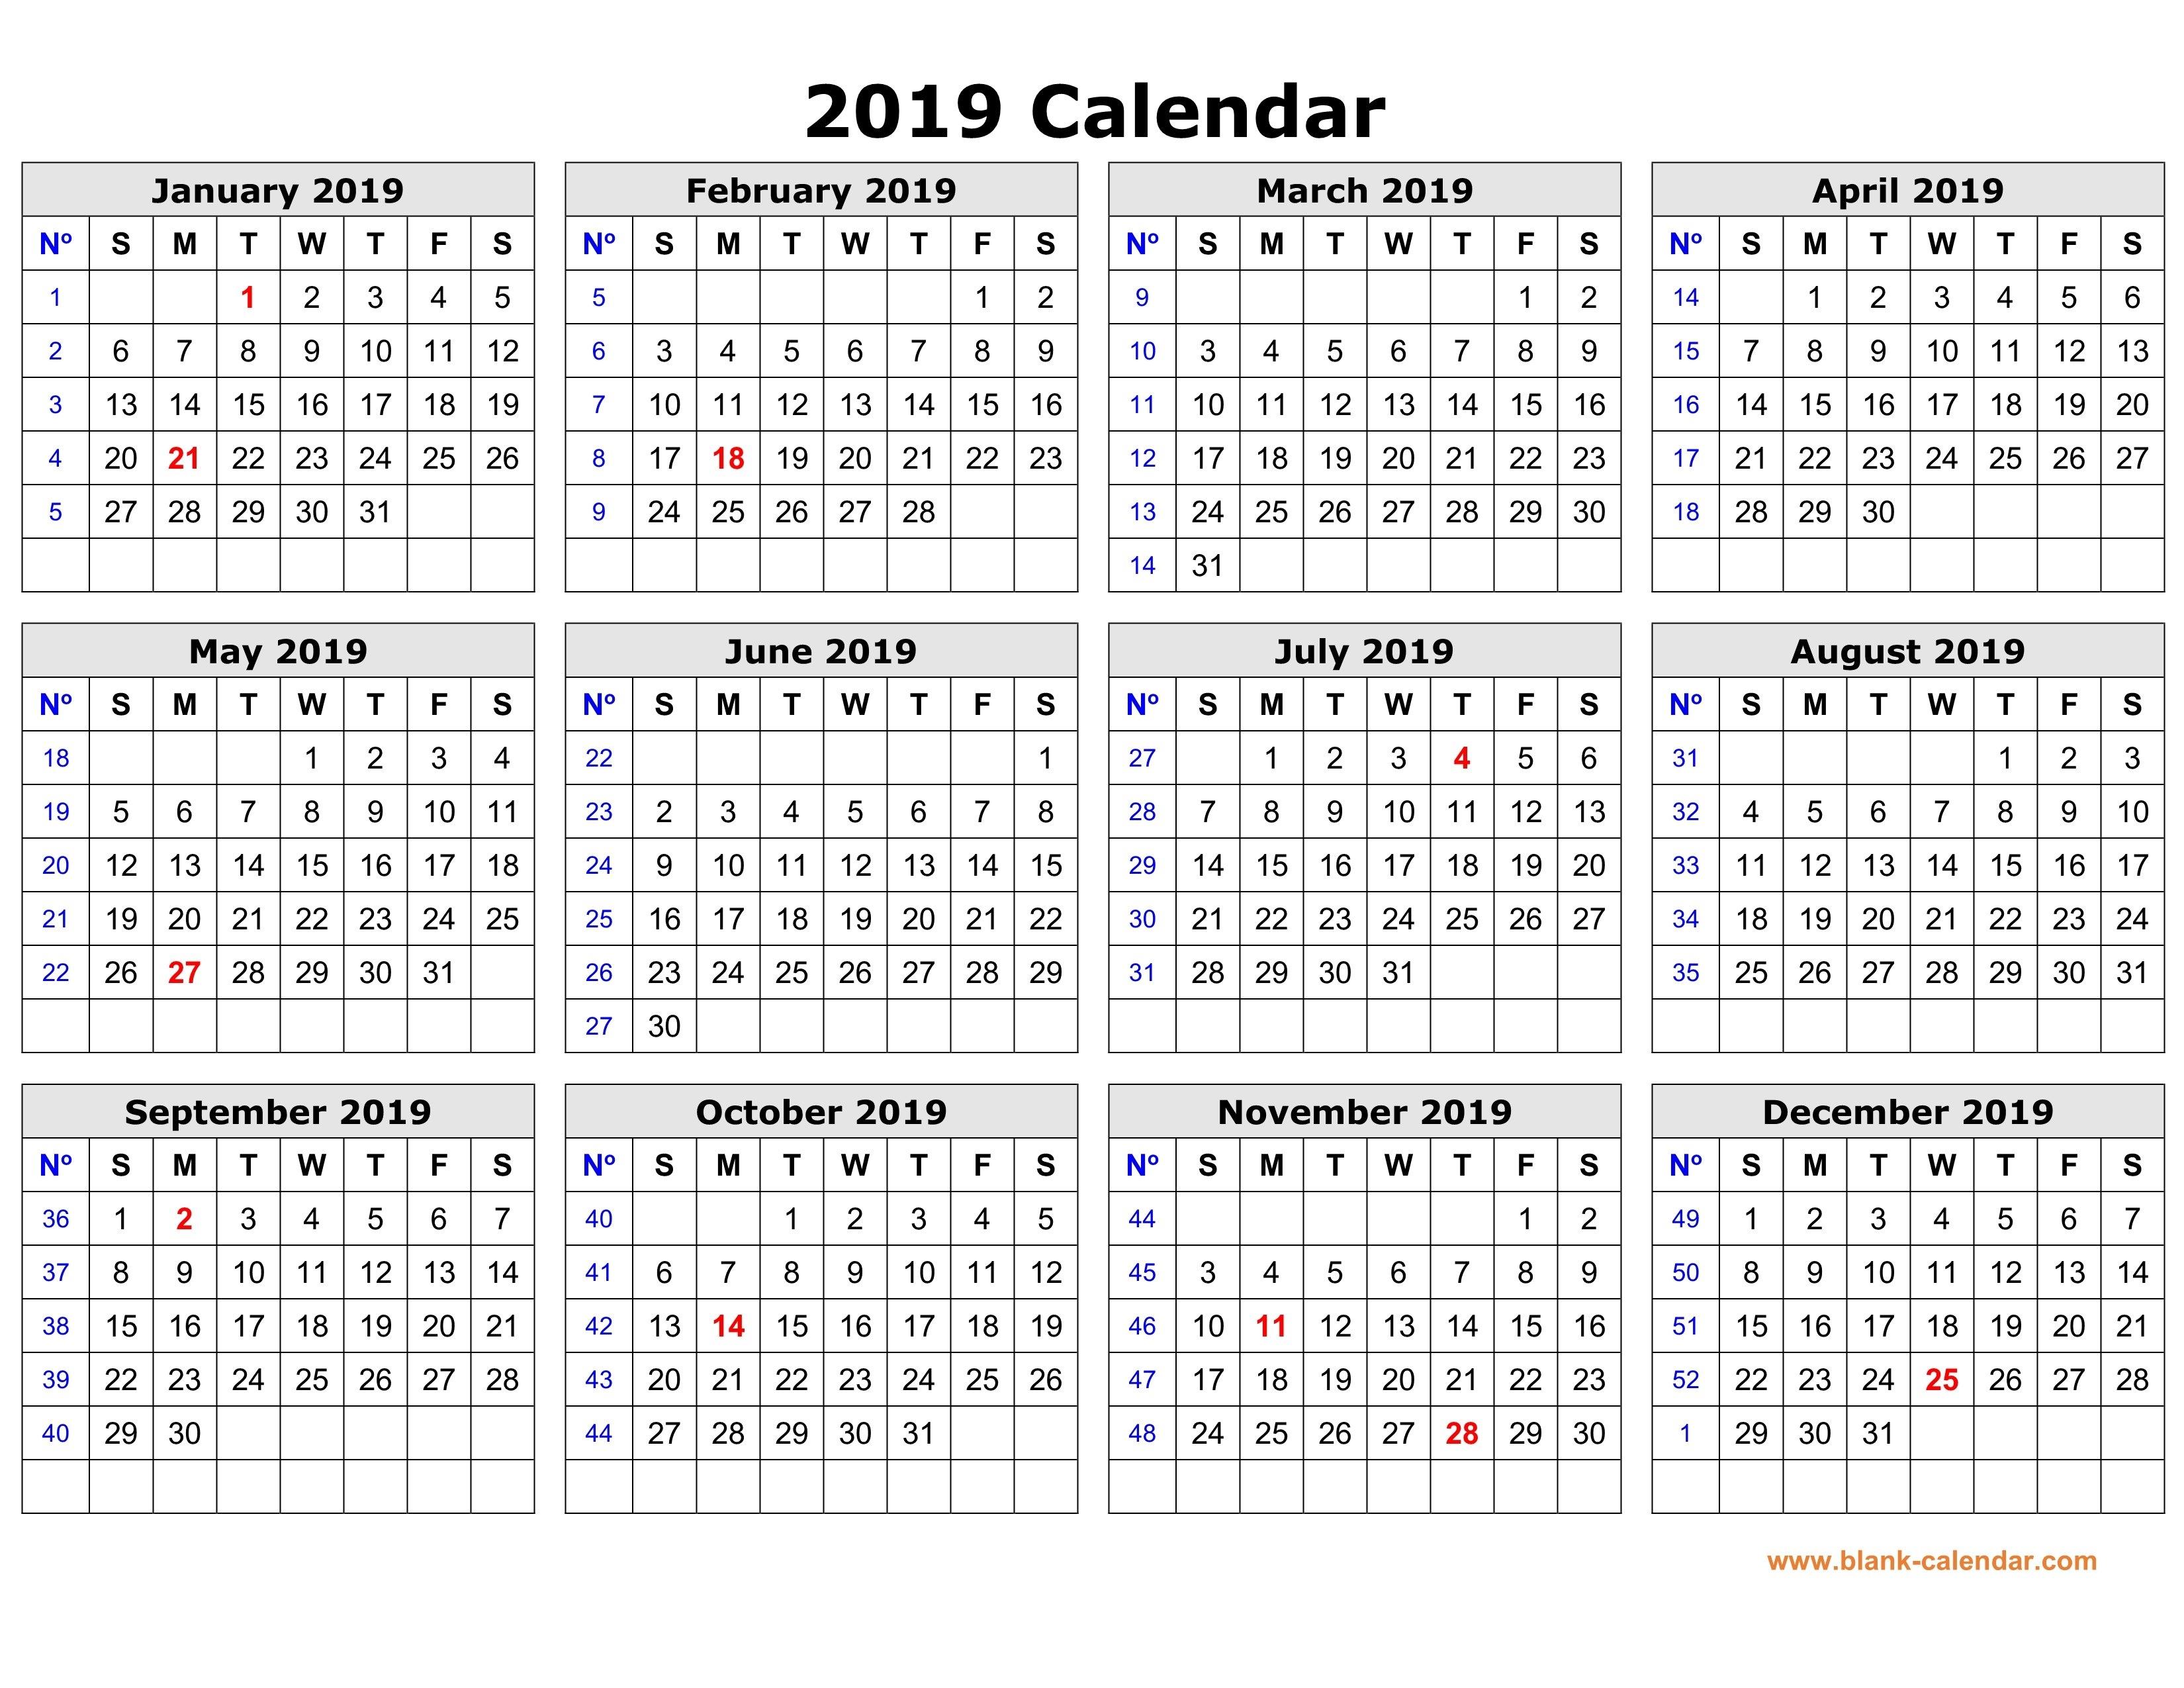 Free Download Printable Calendar 2019 In One Page, Clean Design. Calendar 2019 Year Planner Printable